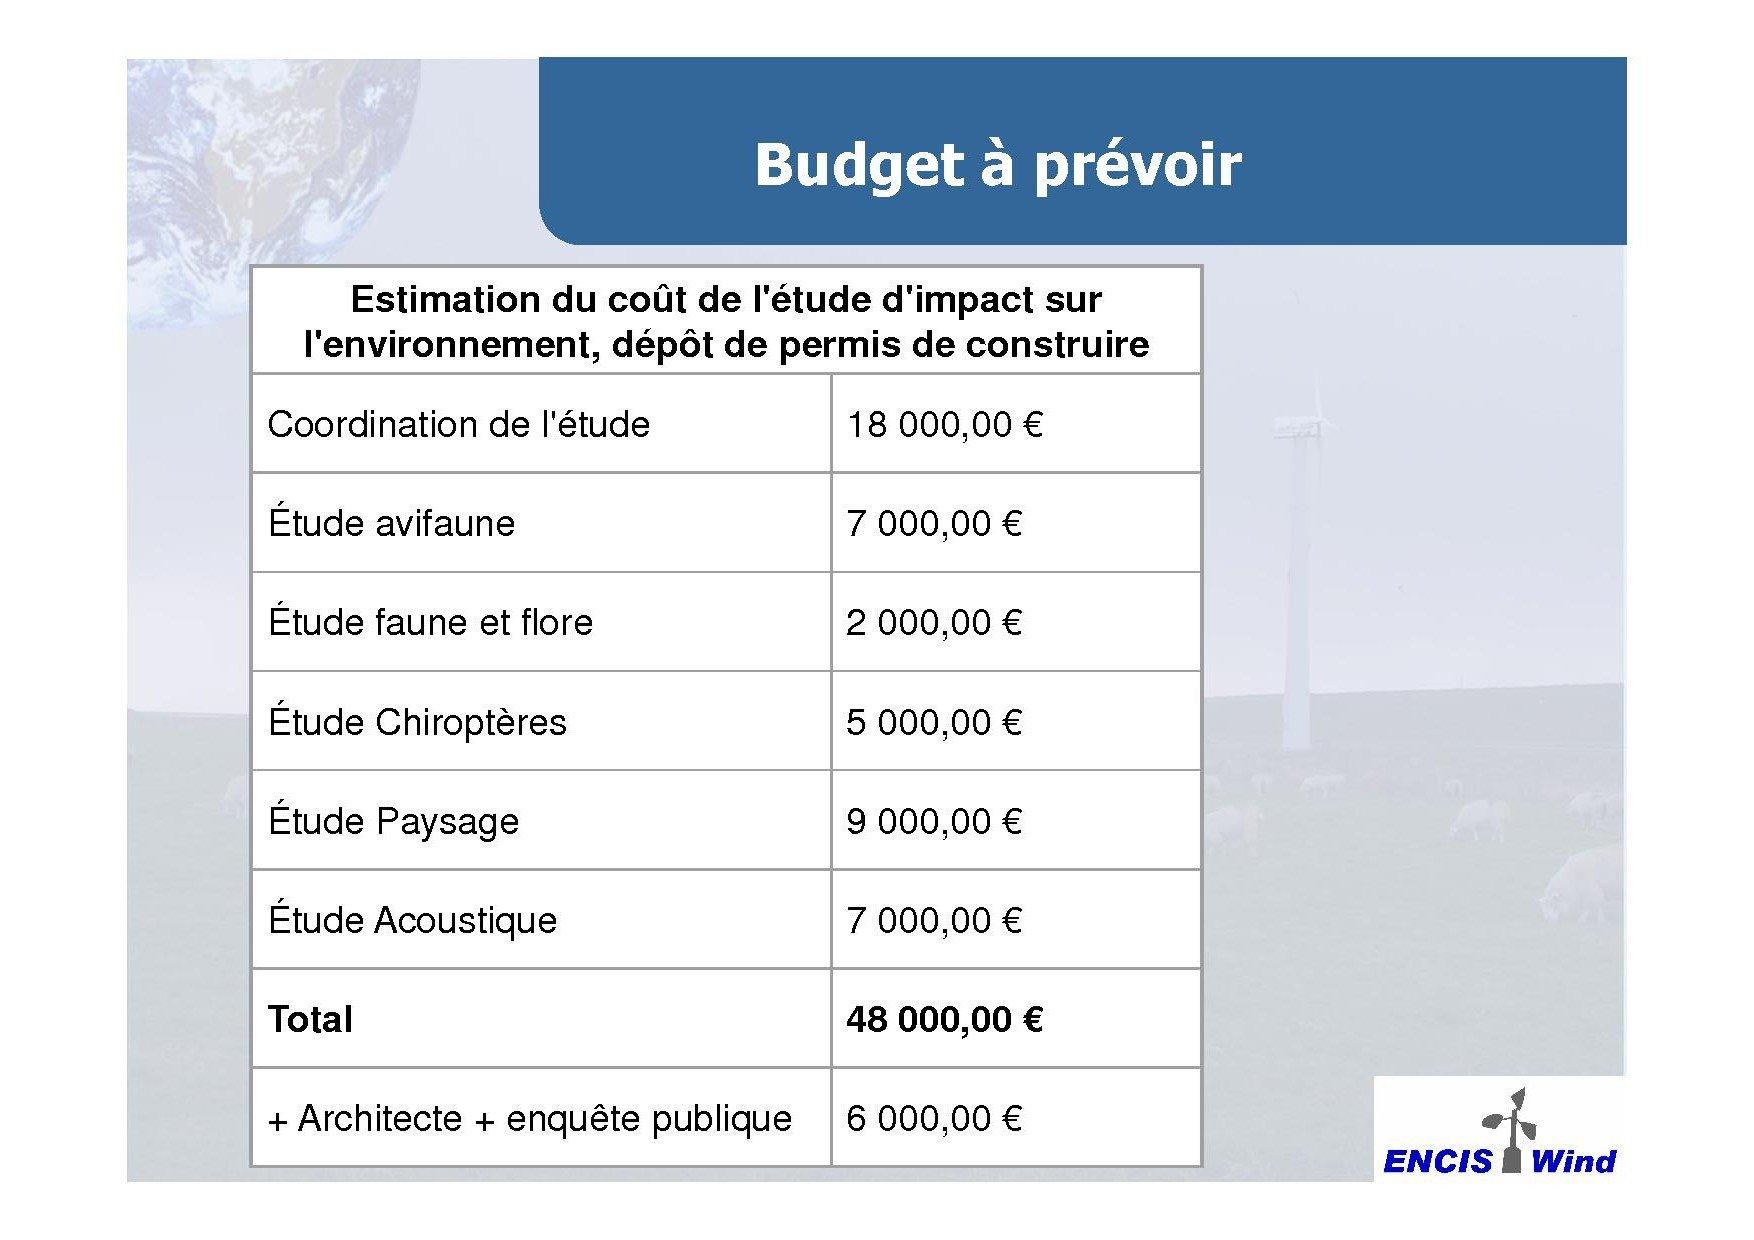 budgetprvupouretudesenciswind.jpg